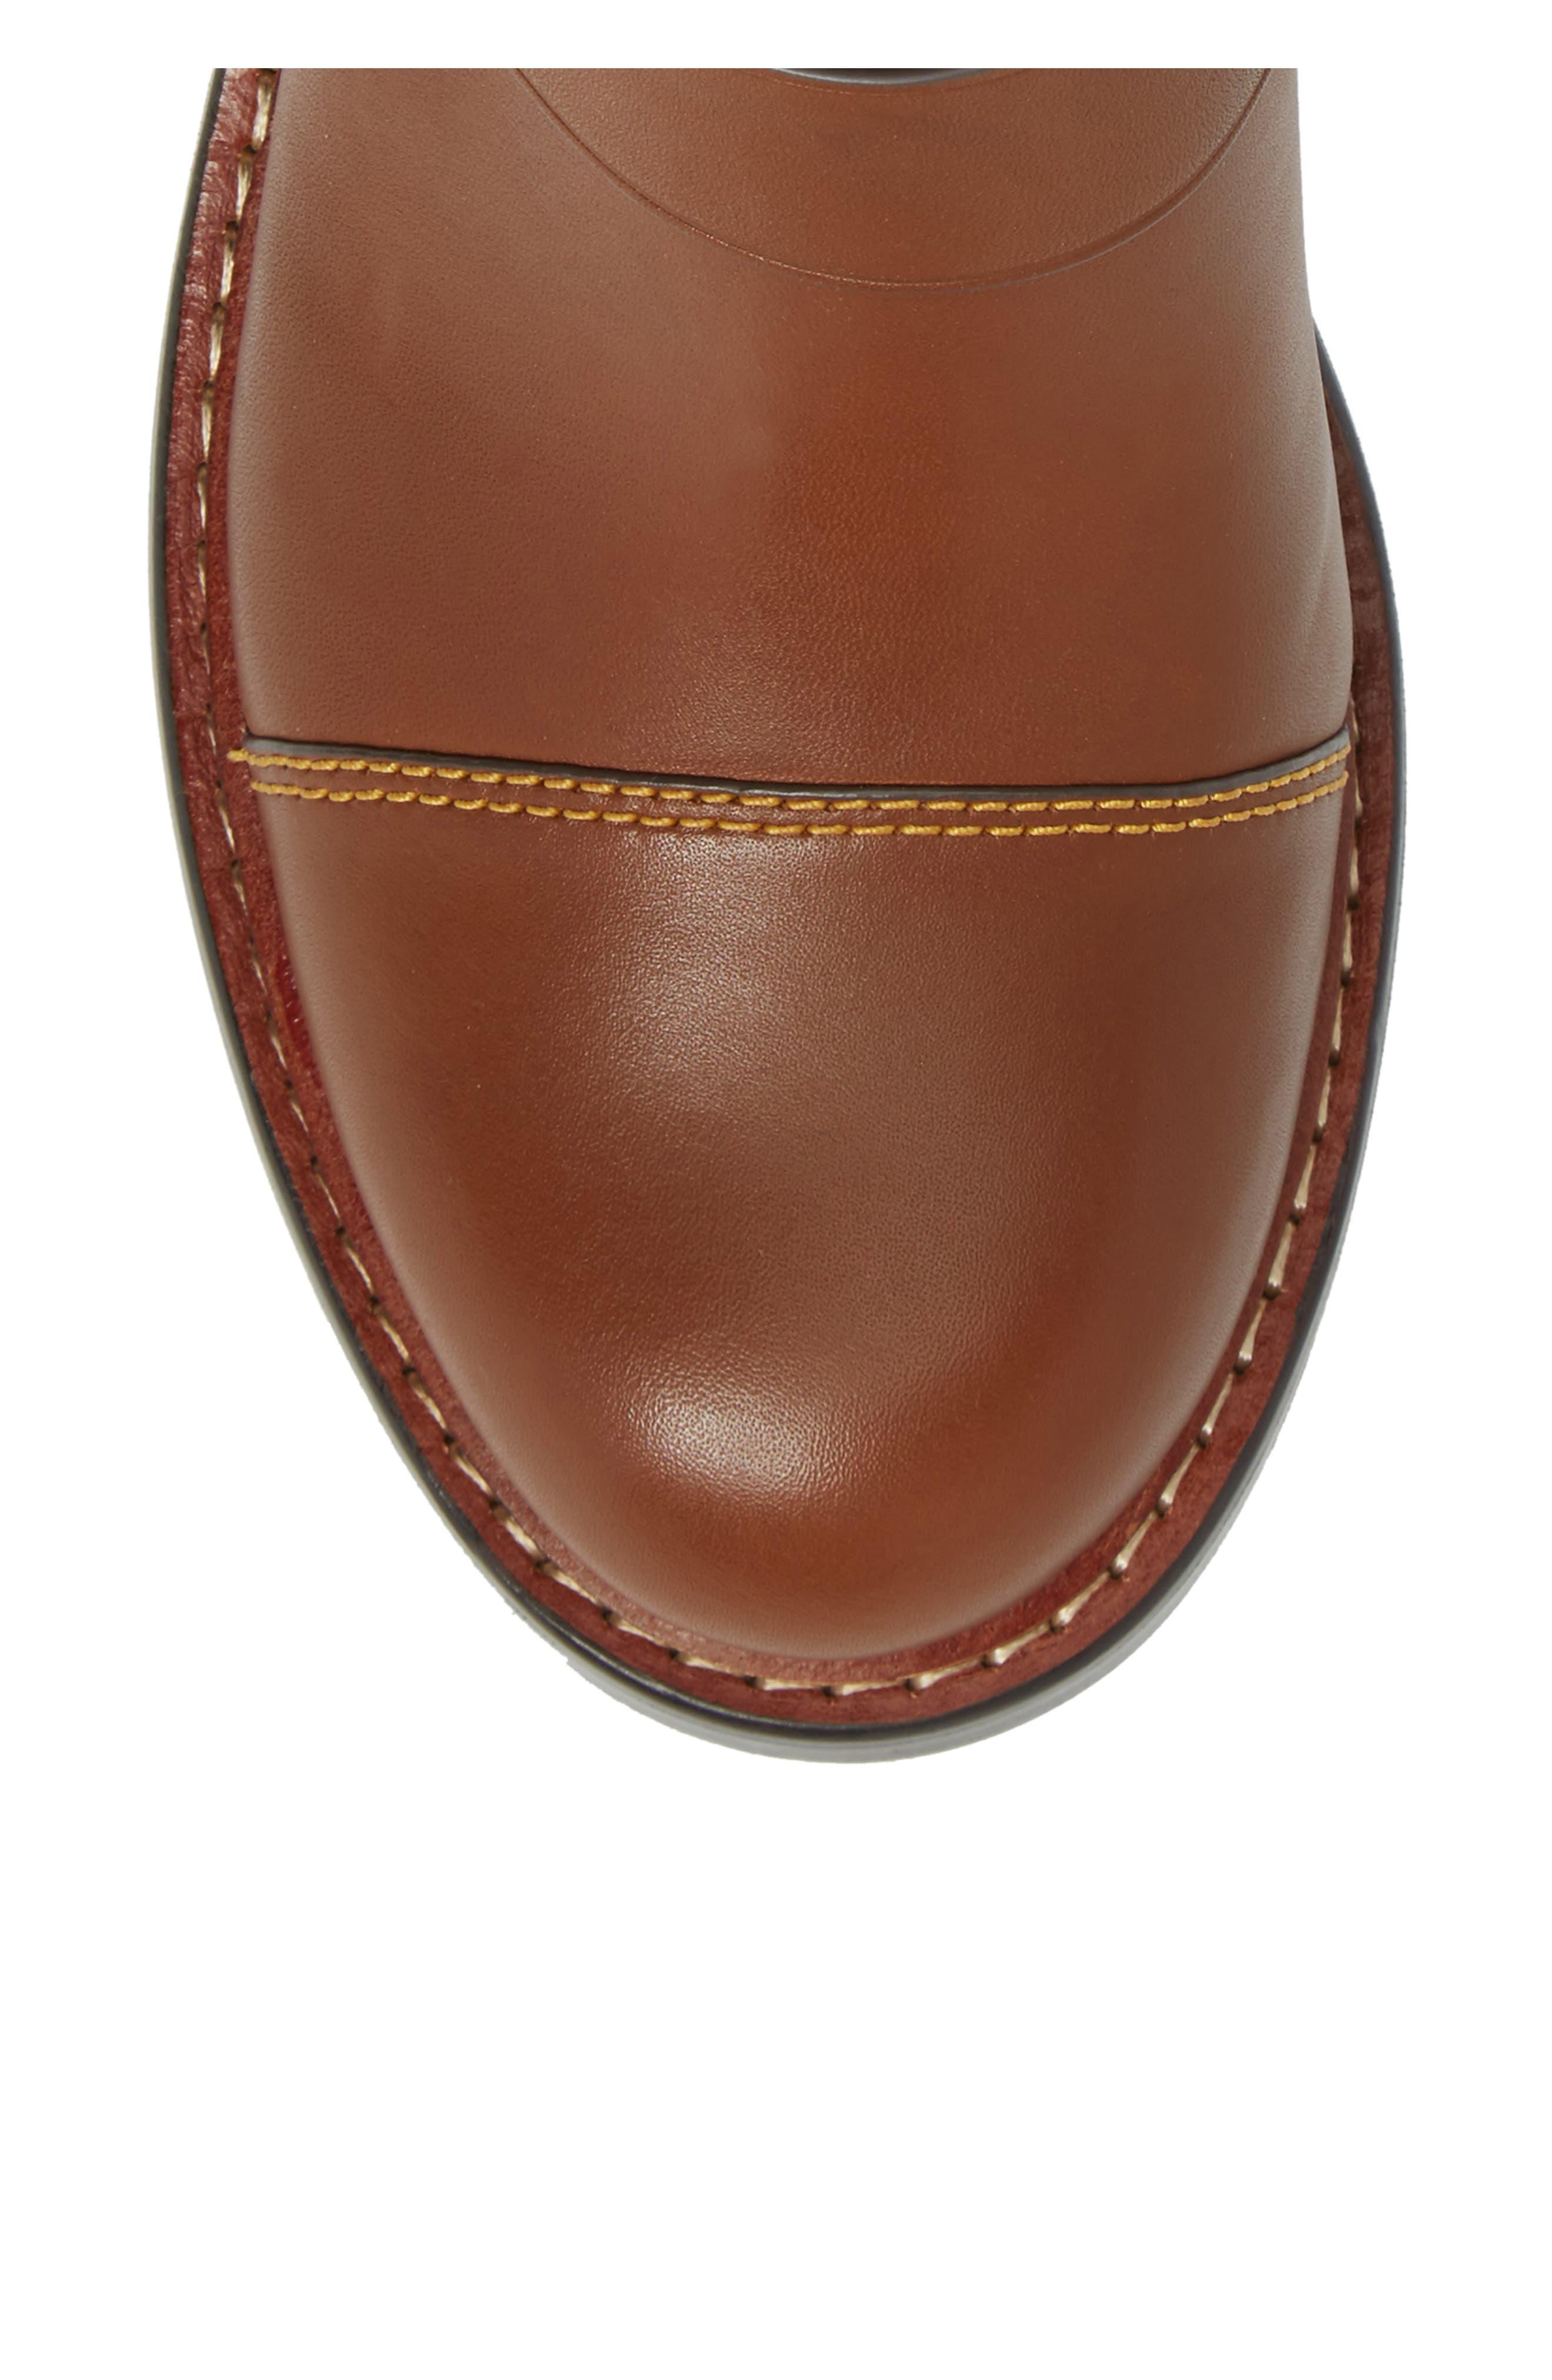 Moto Bootie,                             Alternate thumbnail 5, color,                             Dark Saddle Leather